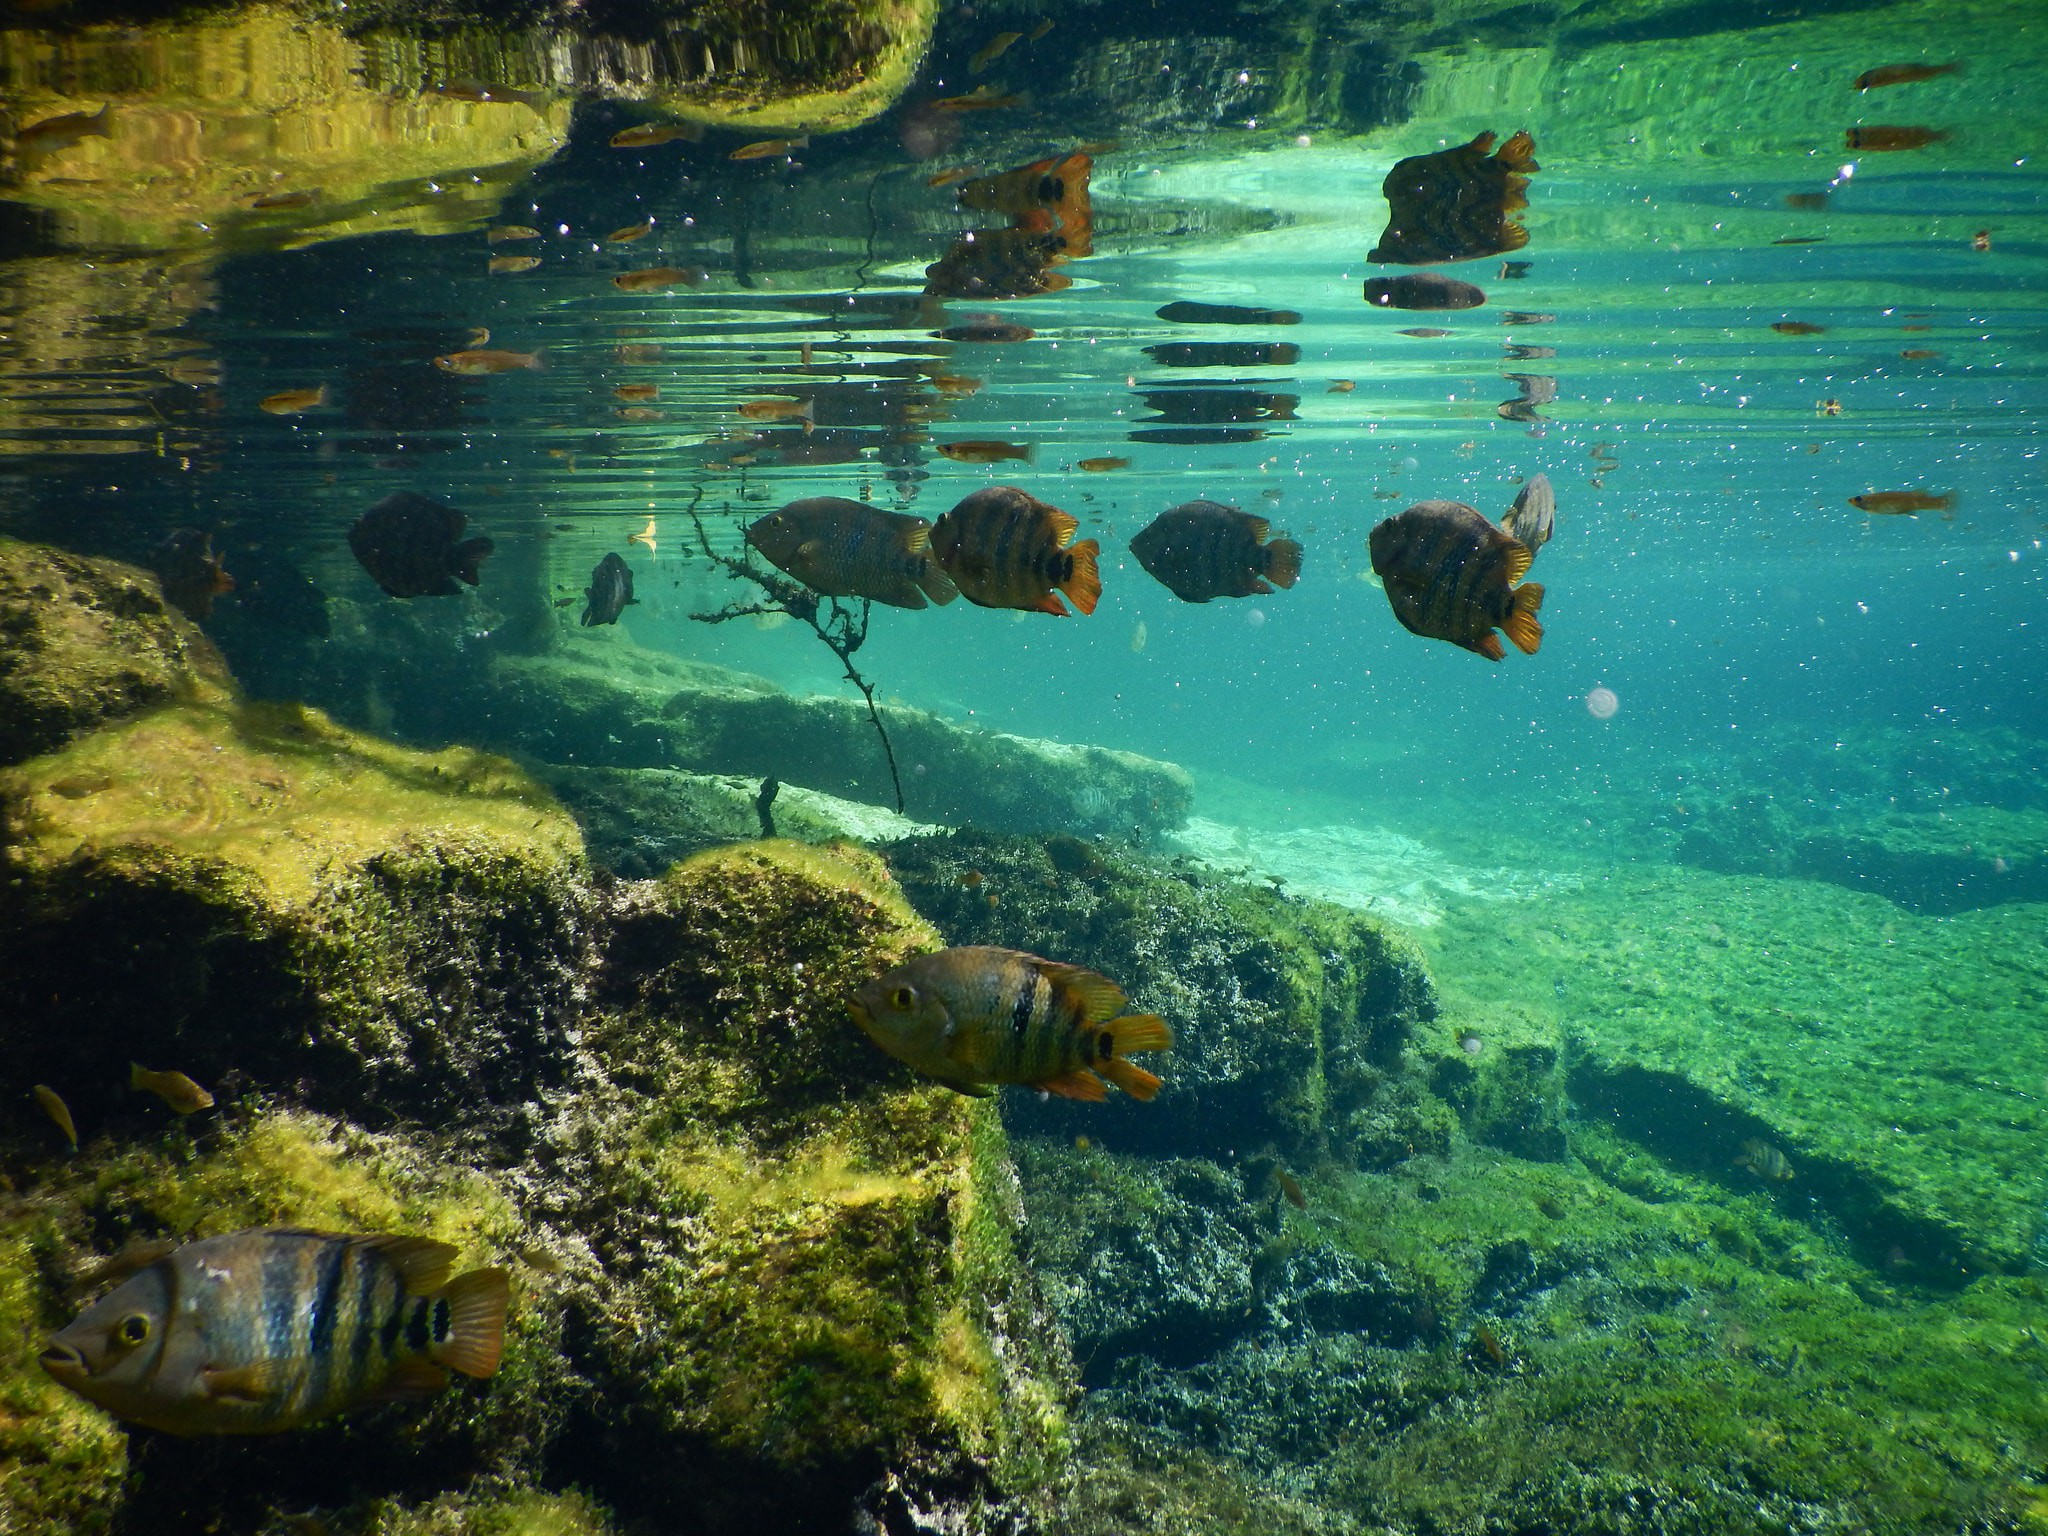 Cenote fish | © Lara Danielle / Flickr